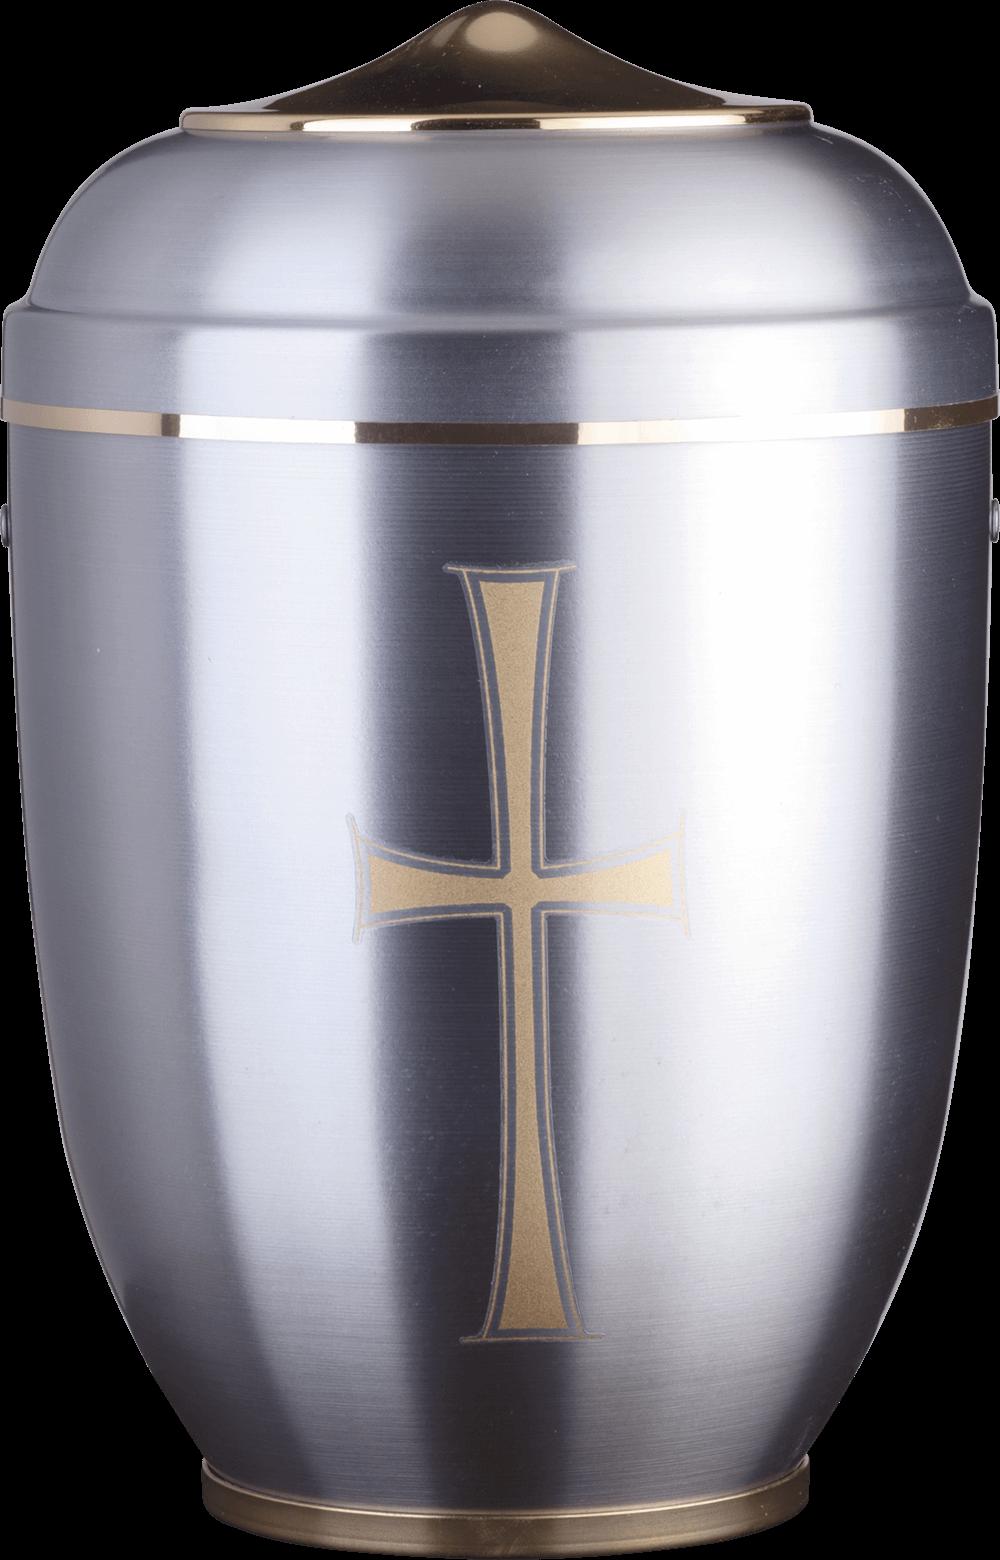 1710 K Stahl | Goldkreuz | Haube Messing